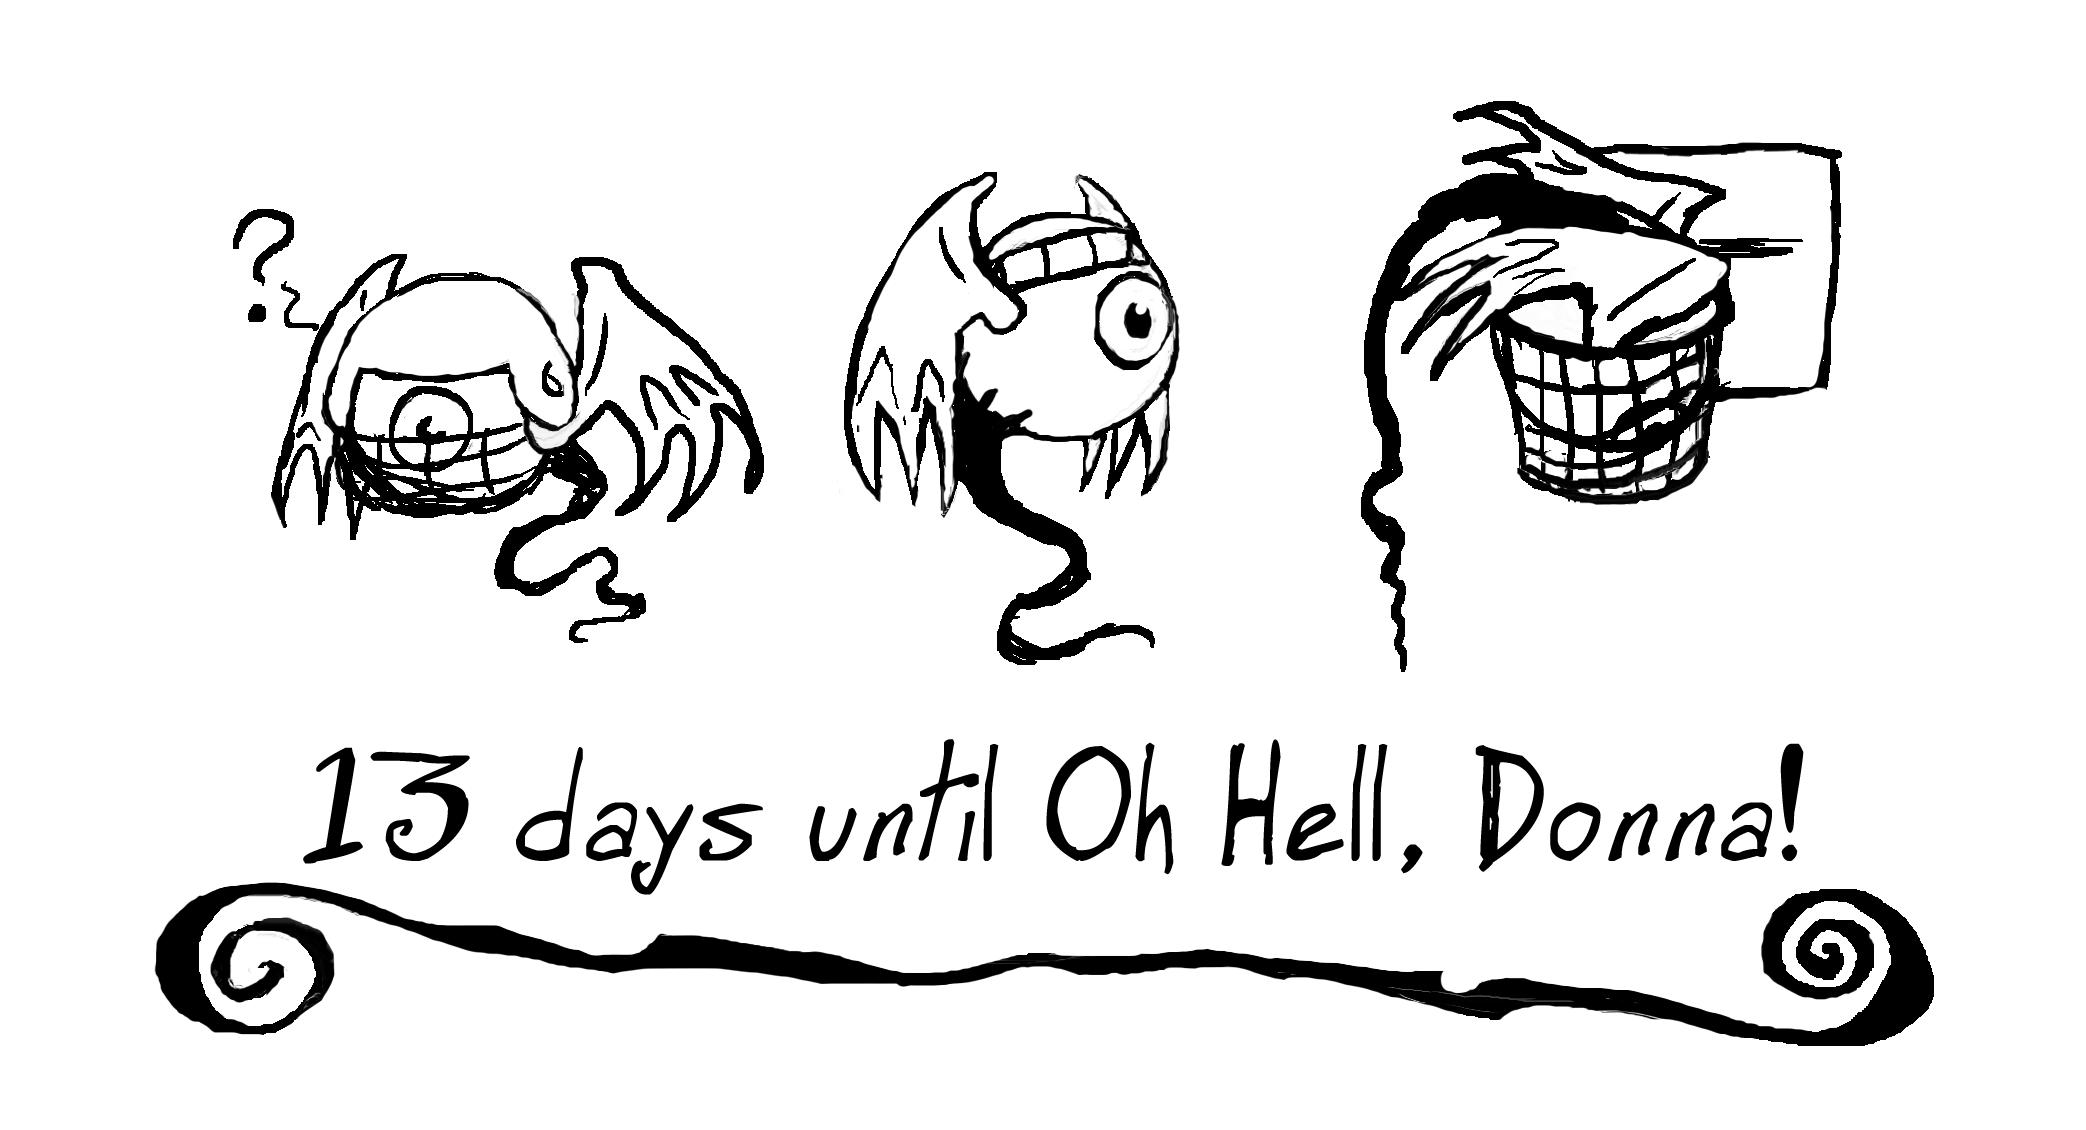 13 Days!